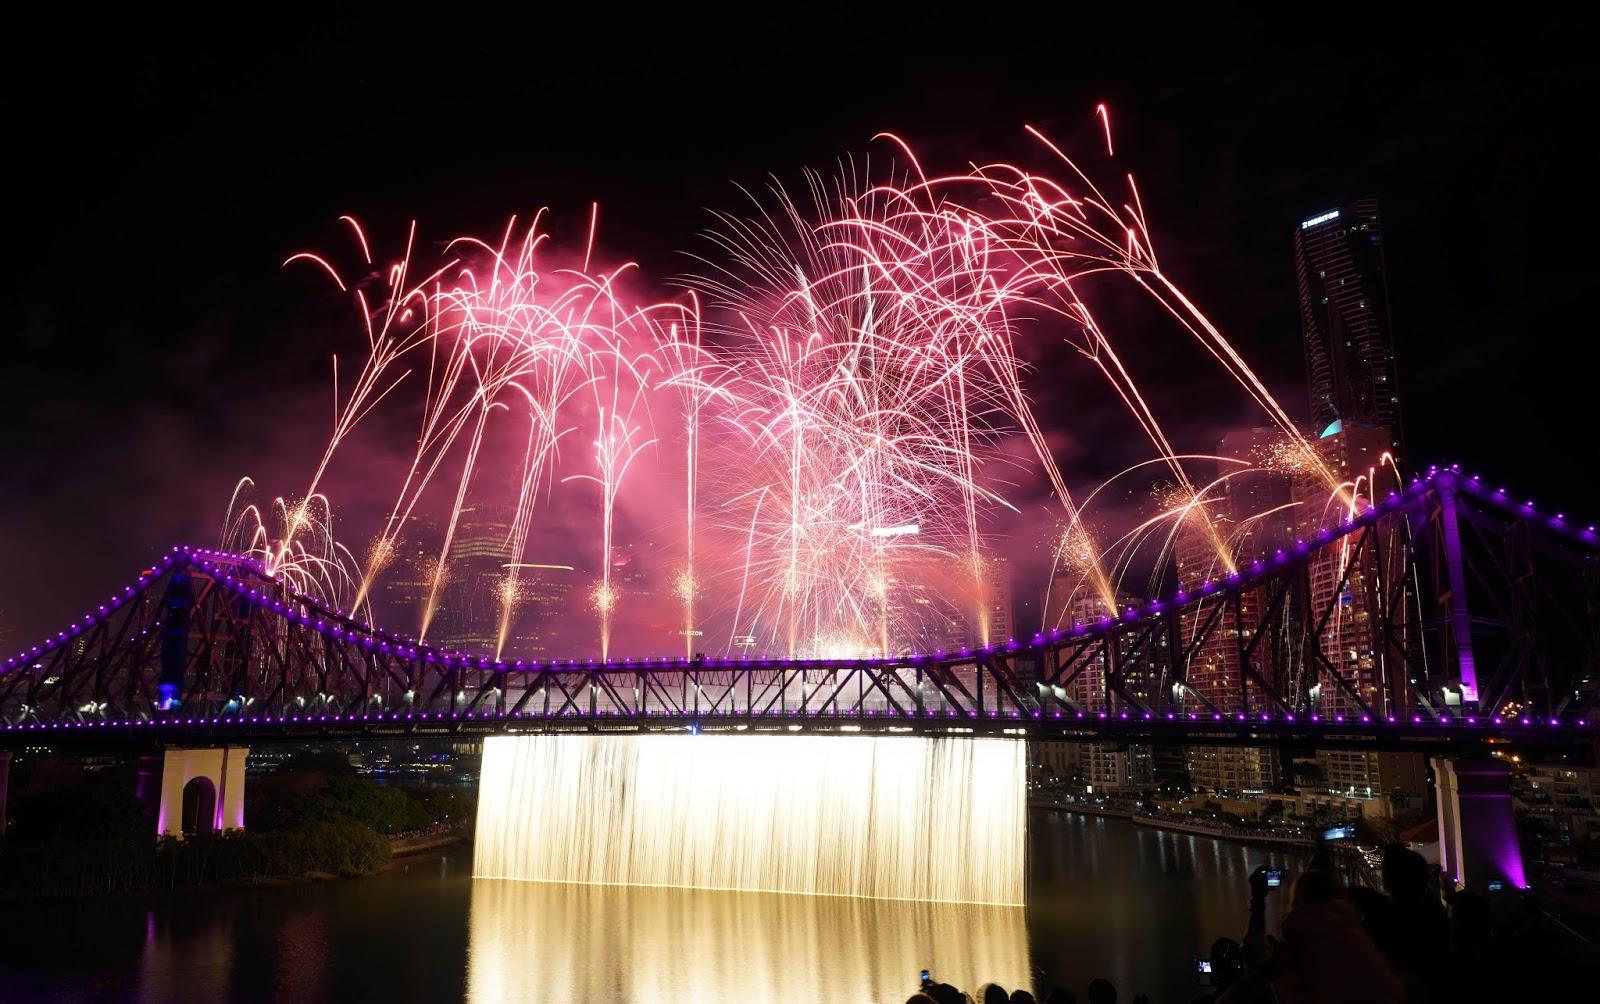 布里斯本-景點-推薦-故事橋-旅遊-自由行-Brisbane-Attraction-Story-Bridge-Tourist-destination